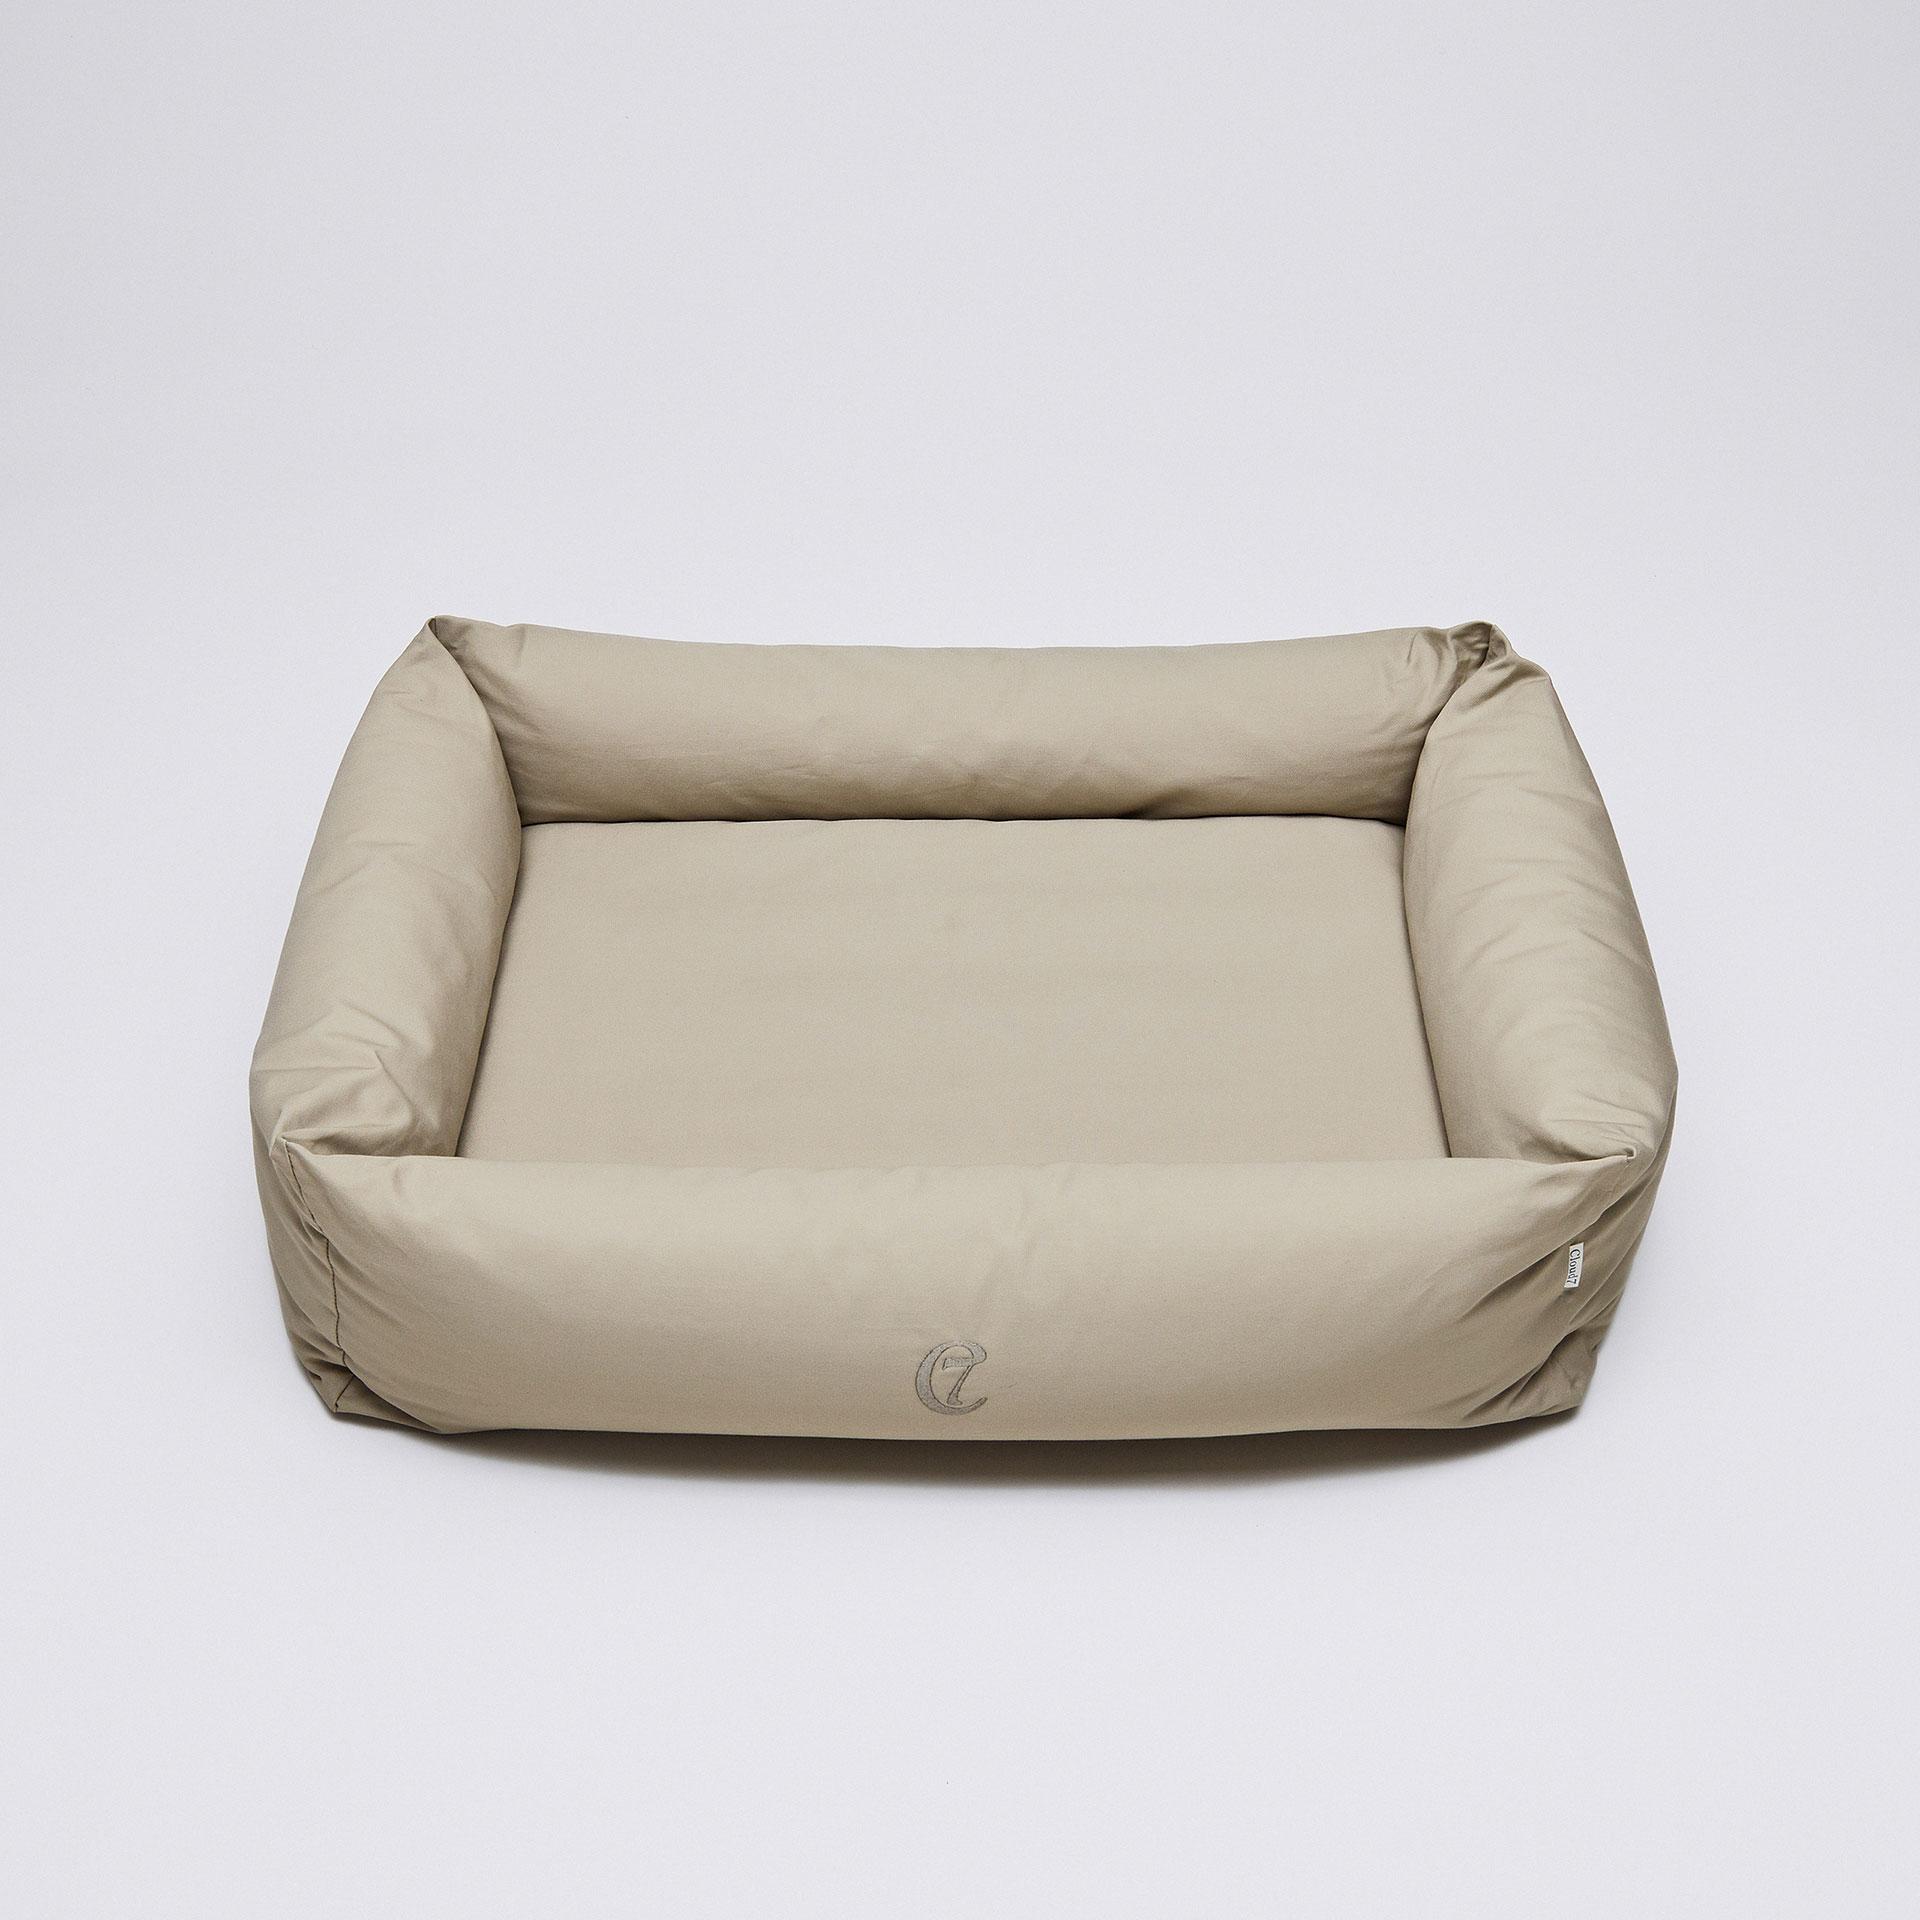 hundebett von cloud7 organic canvas sleepy sand gr s amy friends. Black Bedroom Furniture Sets. Home Design Ideas